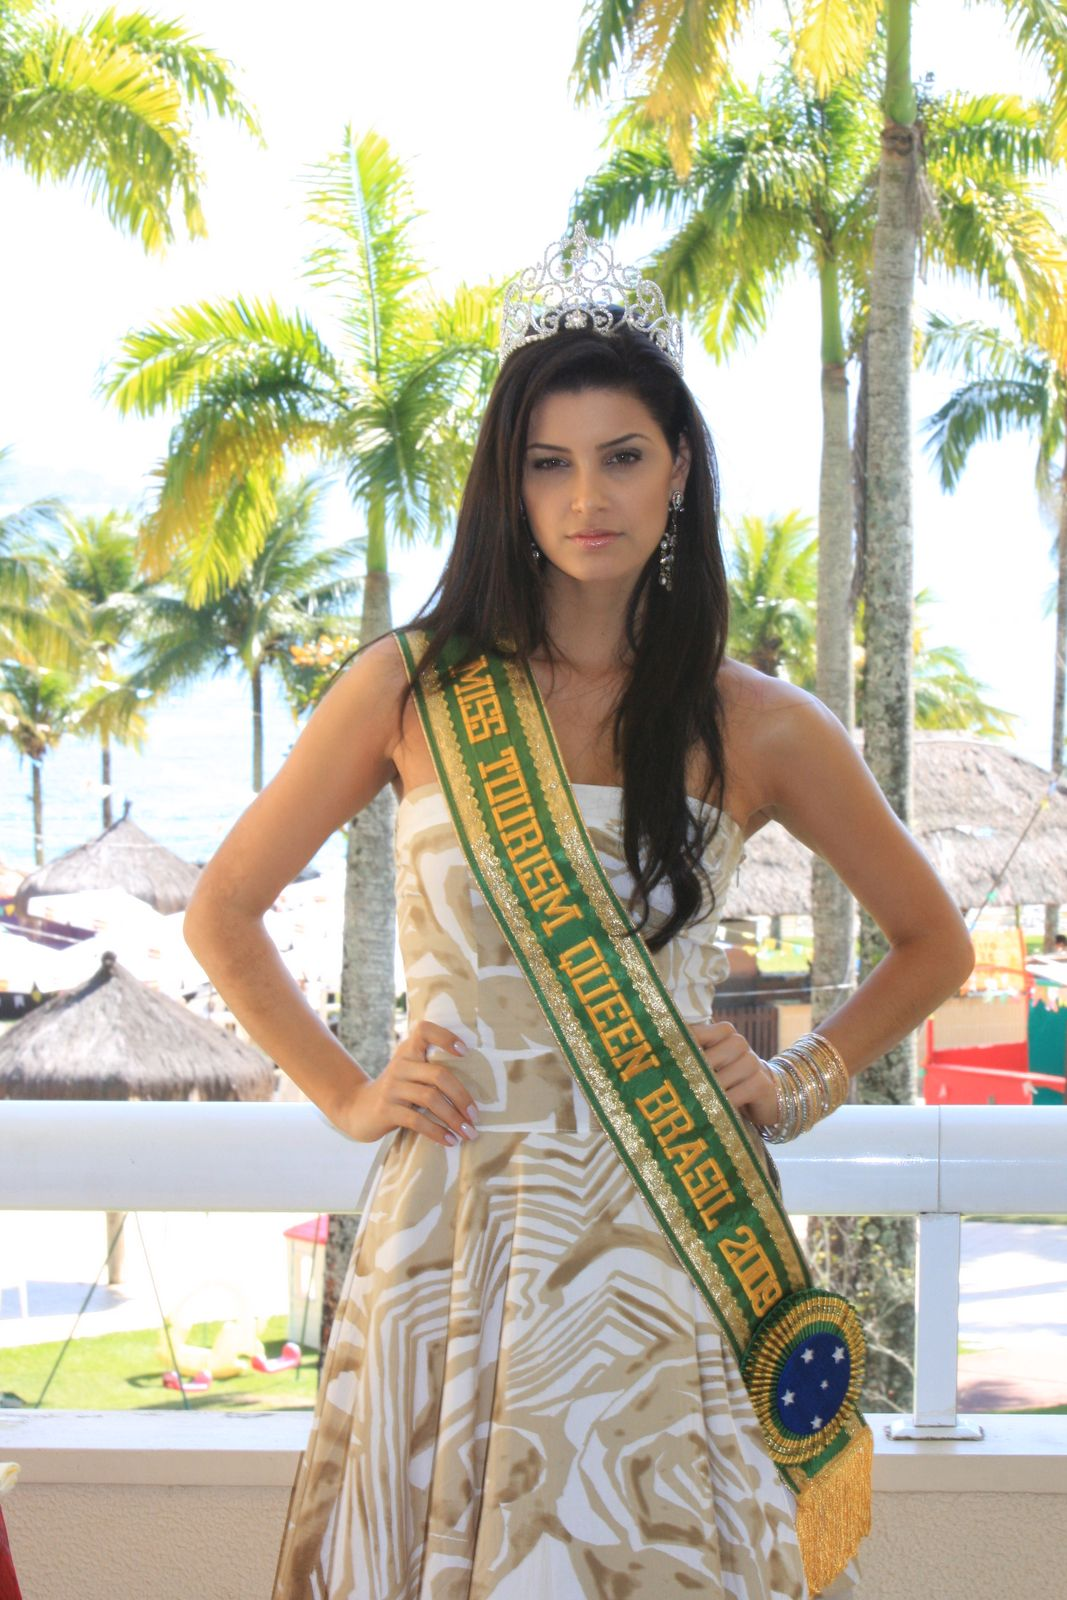 vivian noronha, rainha hispanoamericana 2008. suplente. - Página 4 Nthhvyzh